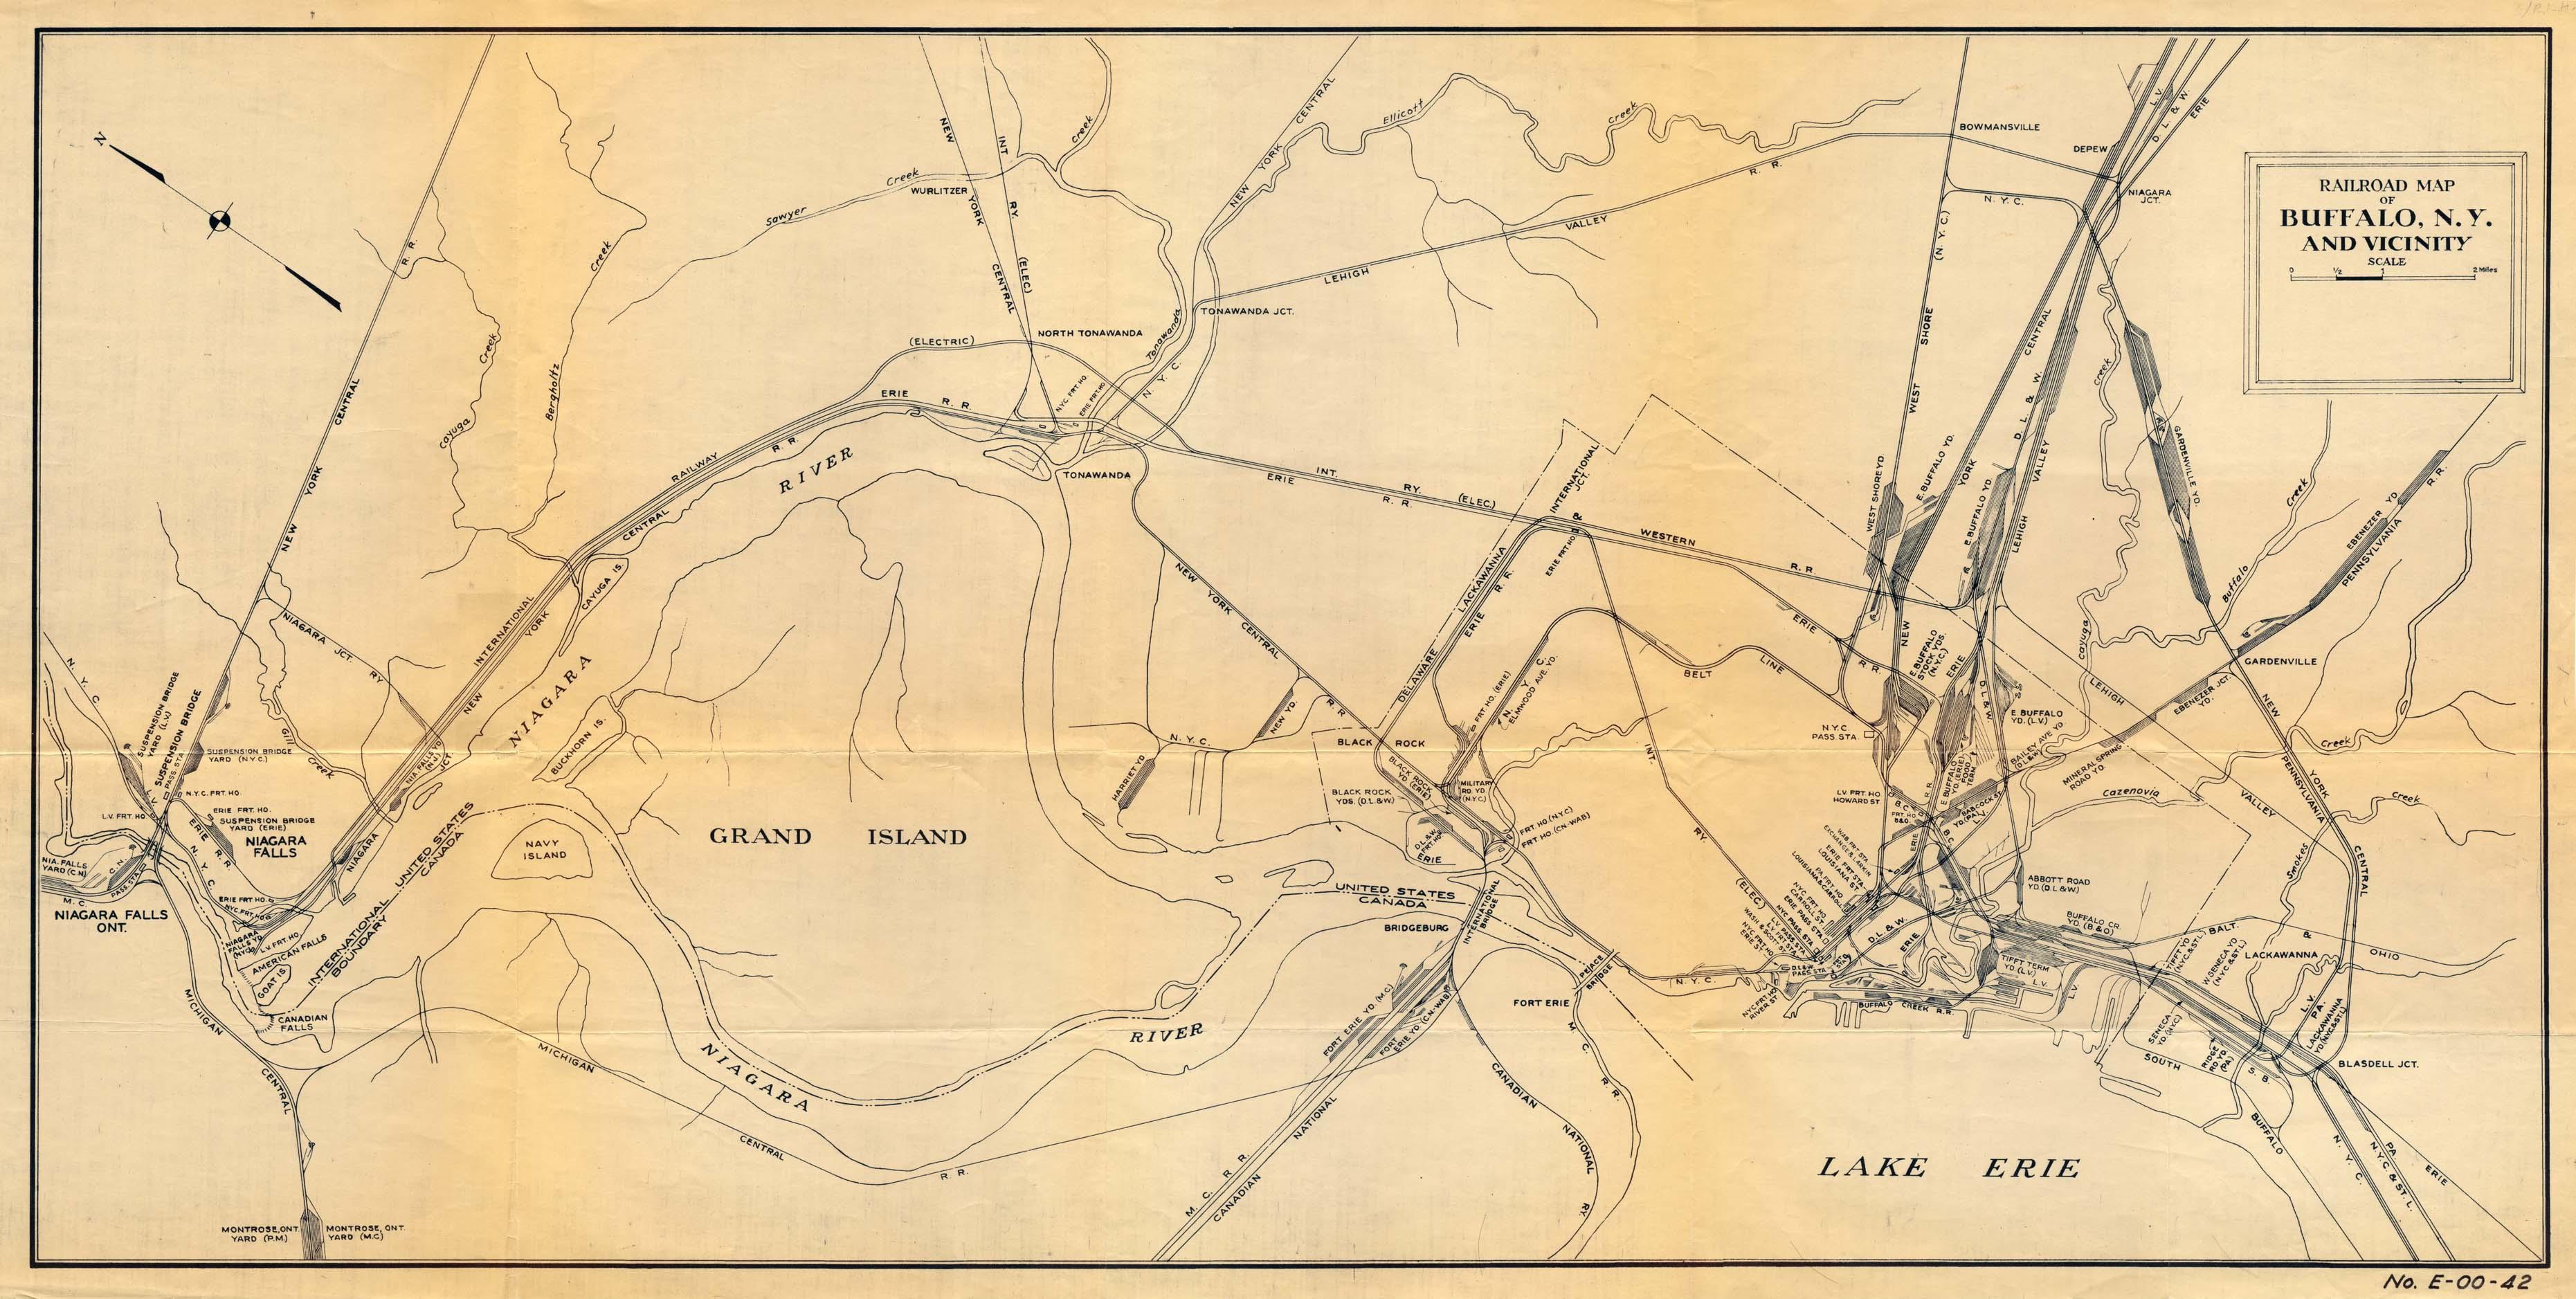 Buffalo RR Map on map norfolk va, new york city, map los angeles ca, map brunswick me, map wilmington de, map evansville in, map phoenix az, map atlanta ga, buffalo bills, map charleston sc, map new york medical college, map of buffalo metro area, kansas city, map cleveland oh, map of new york, map clearwater fl, niagara falls, map york pa, map washington dc, map niagara on the lake, map atlantic city nj, map cincinnati oh, new york, map bloomington il, map aurora co,